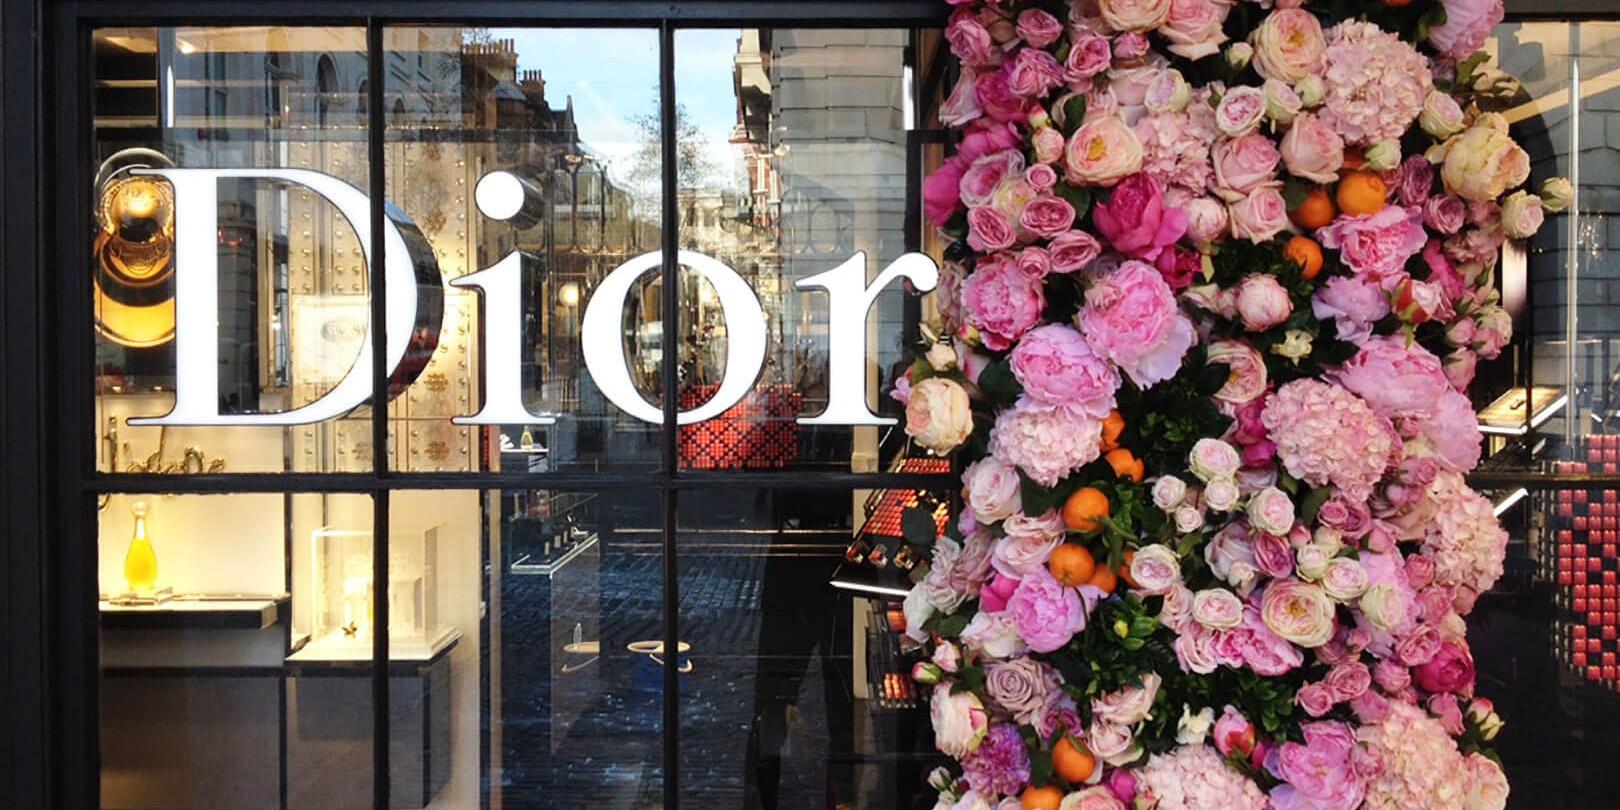 Dior valentines day giveaways event concept miss dior blooming bouquet izmirmasajfo